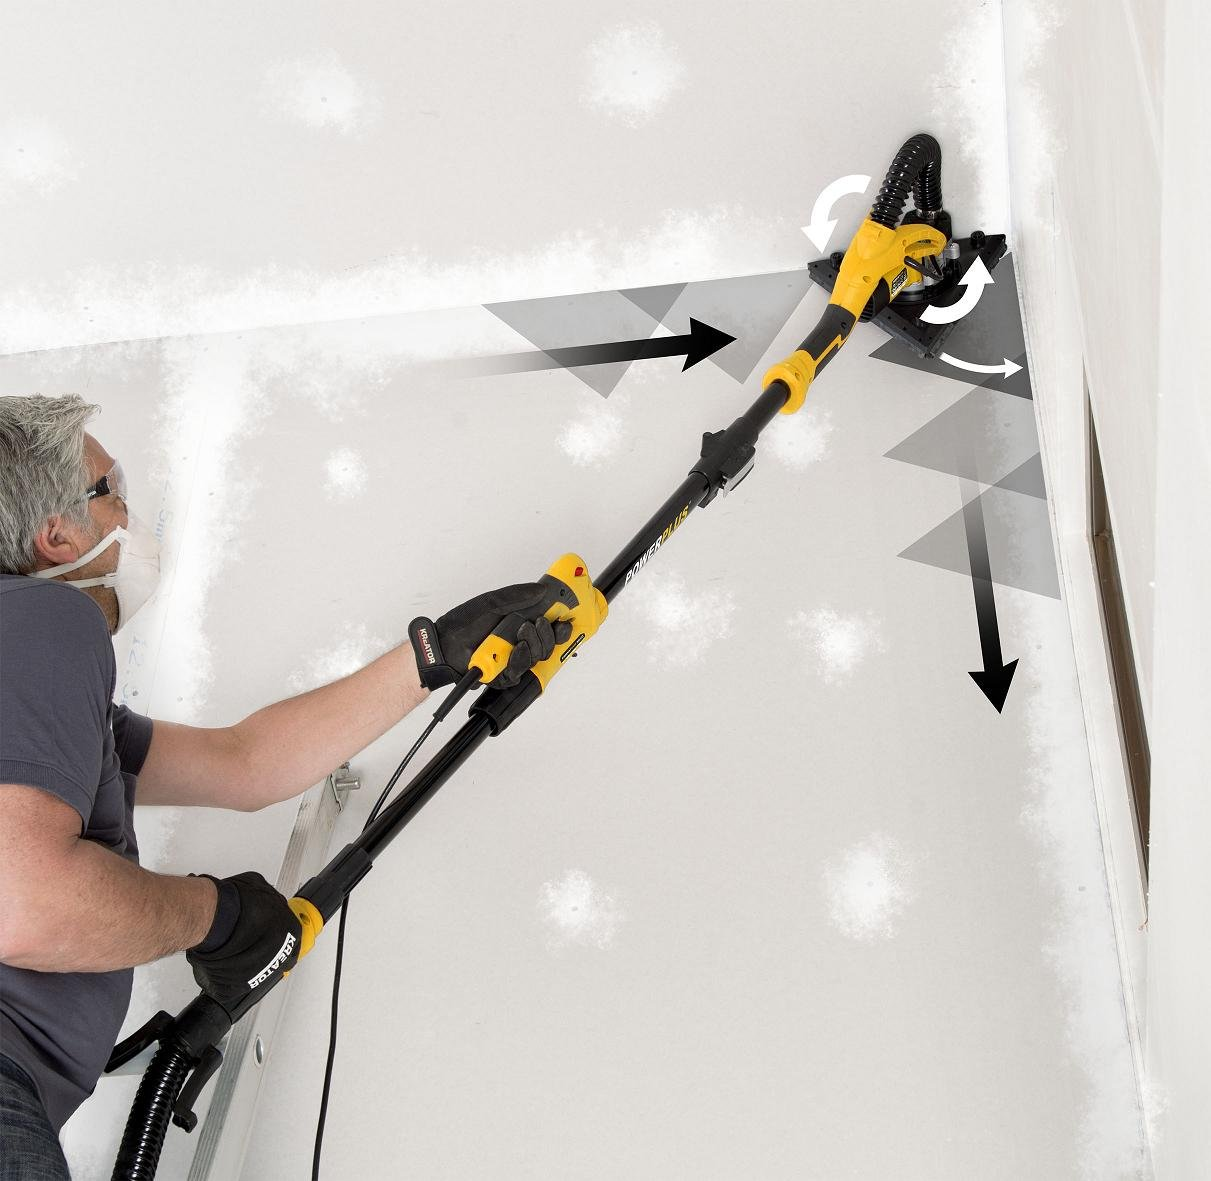 Lijadora de pared Aspiradora techo lijadora de la aspiradora industrial 30L